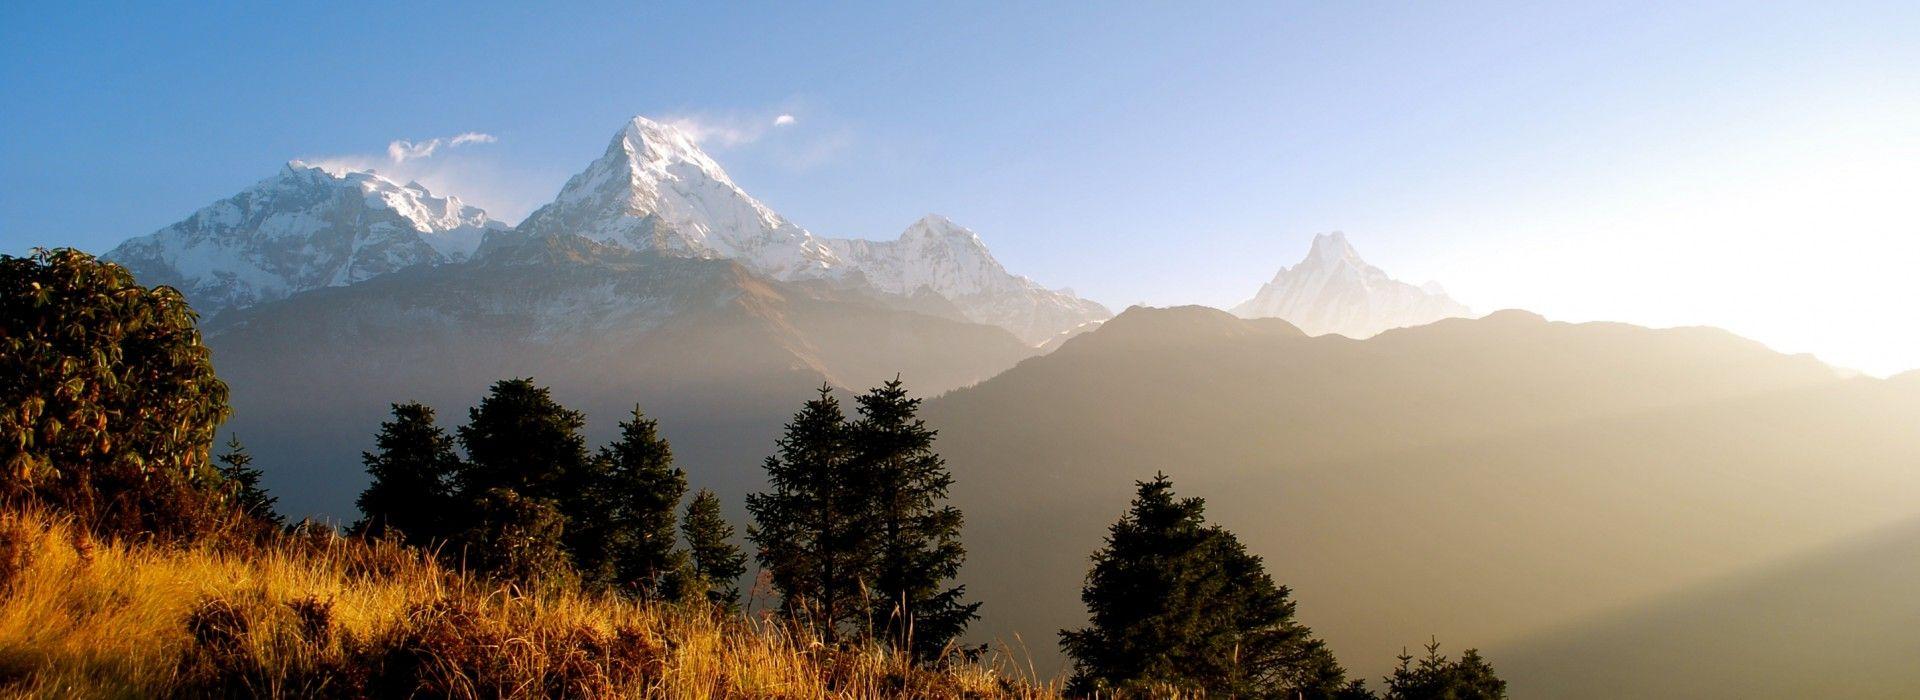 Wildlife, landscapes and nature Tours in Annapurna Circuit trek